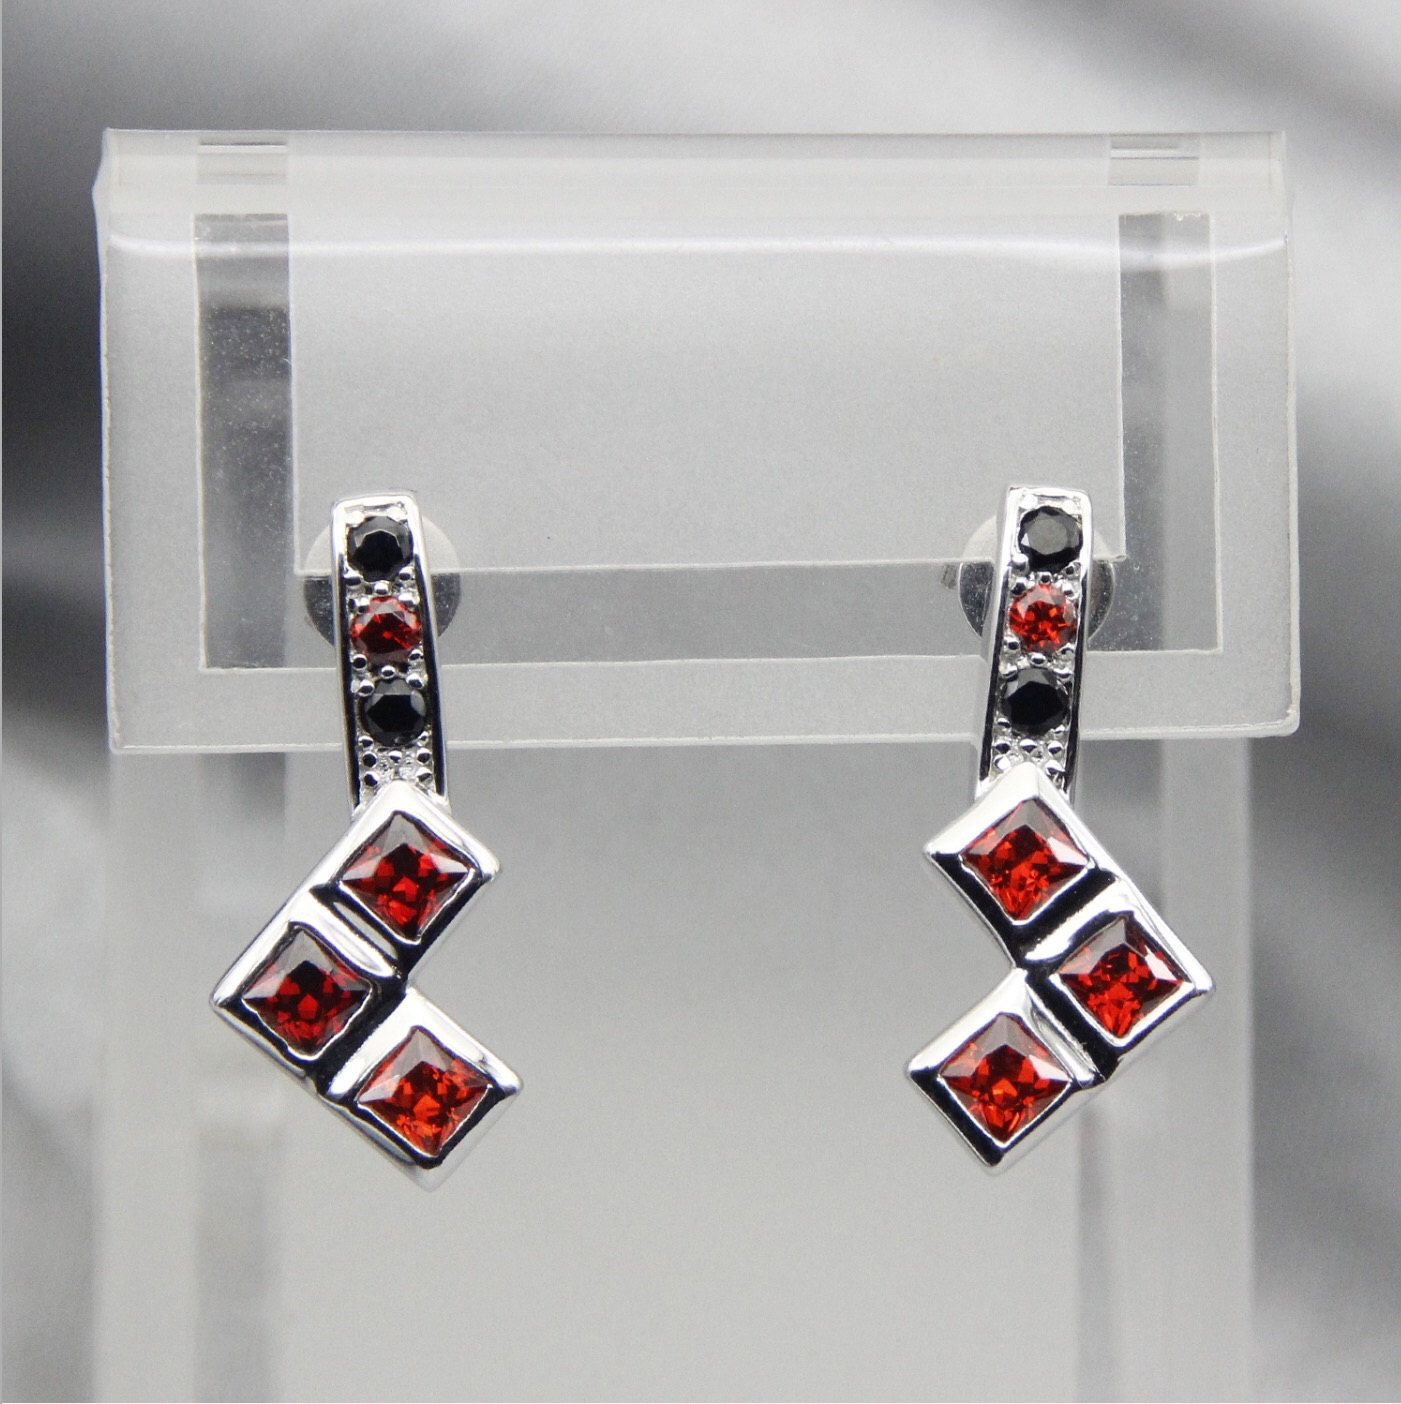 Harley Quinn Ruby And Black Diamond Earrings Wedding Jewelry Engagement Ring  Batman Joker Puddin' Harley